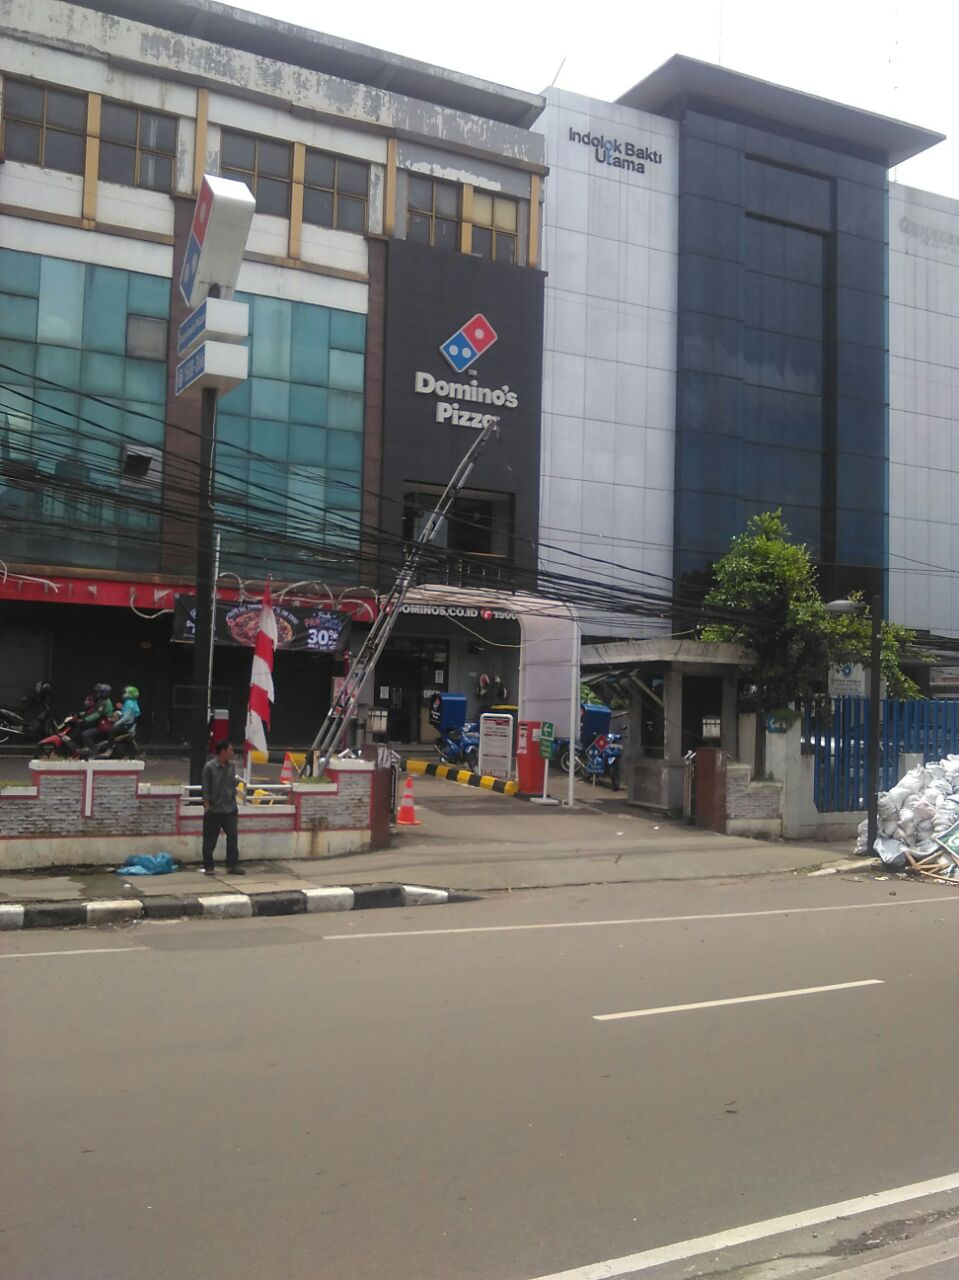 Domino's Pizza - Kec Senen, Jakarta Pusat